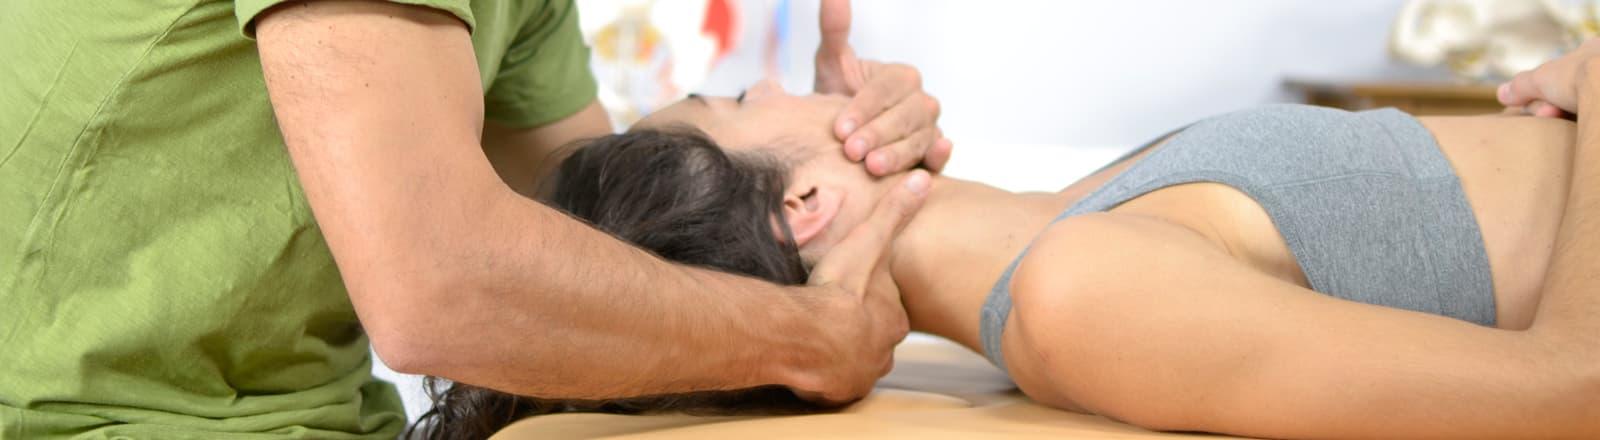 masaje terapéutico Palma